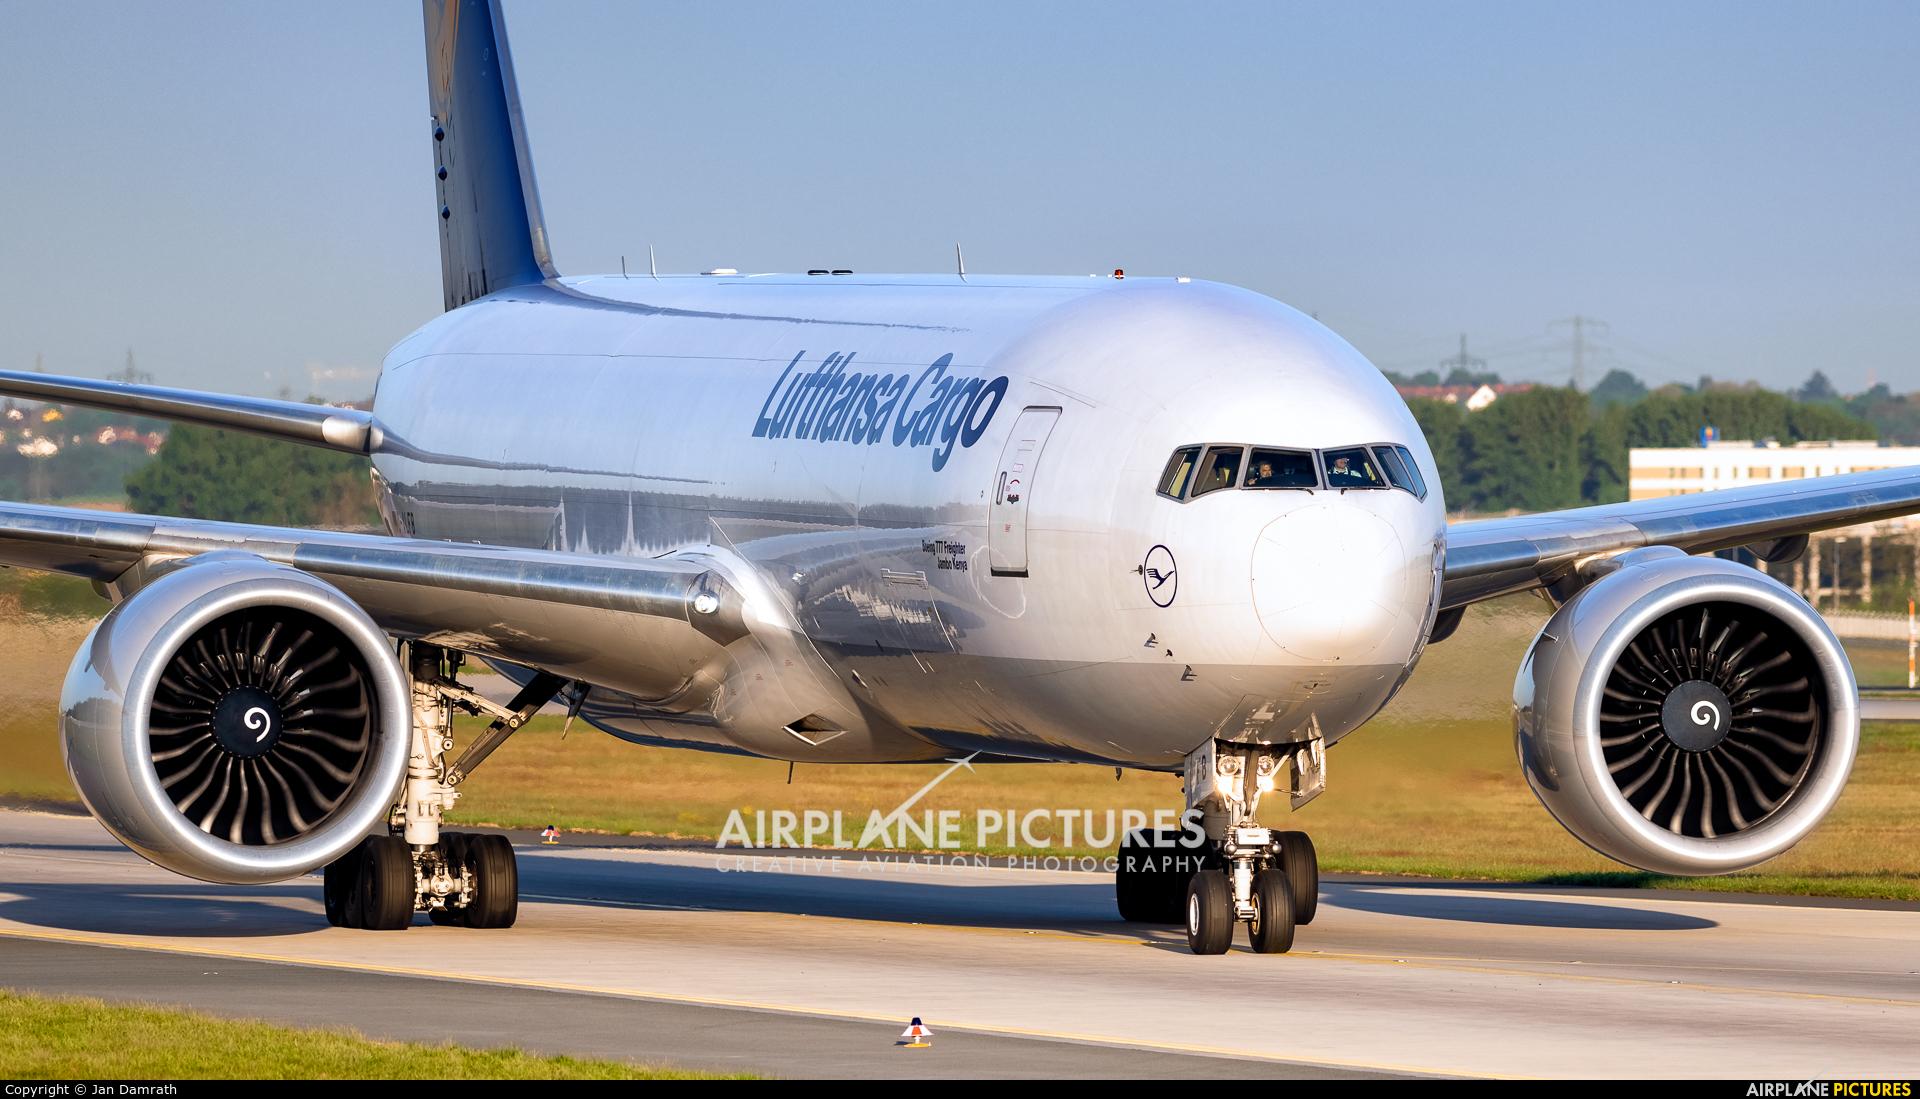 Lufthansa Cargo D-ALFB aircraft at Frankfurt